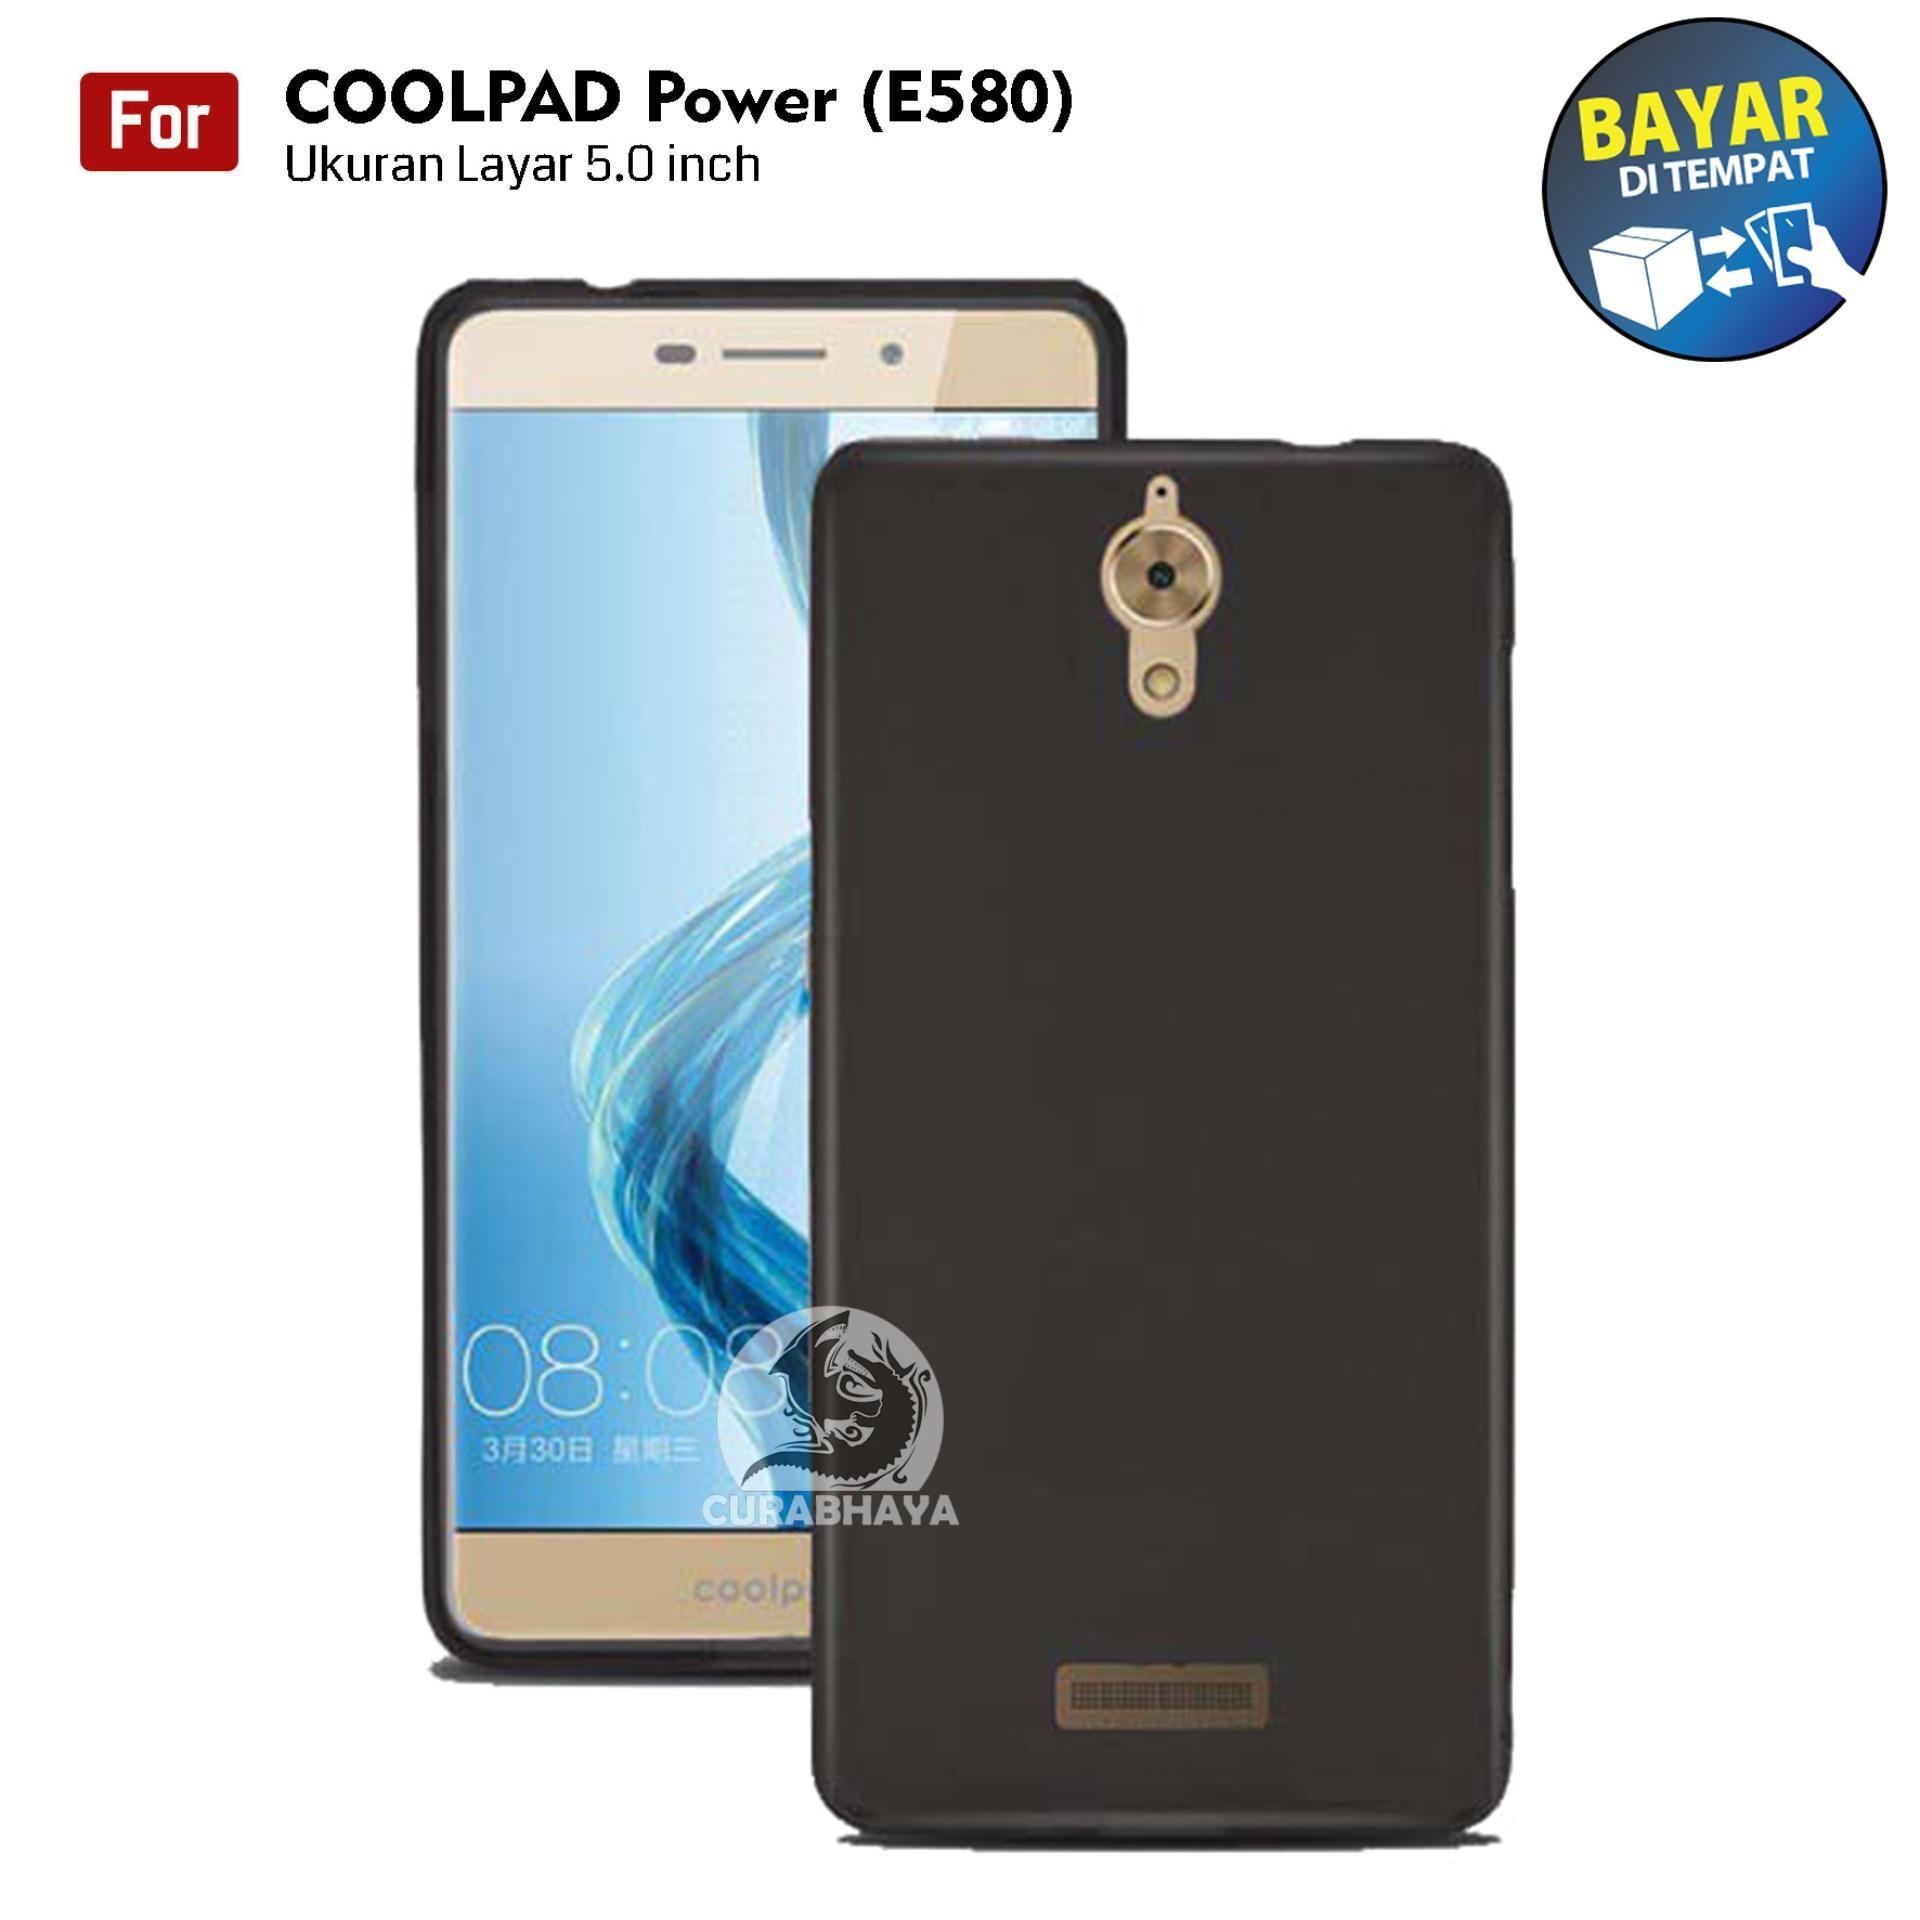 MidNight CoolPad Power / E580 | Slim Case Black Matte Softcase Premium Baby Skin - Hitam